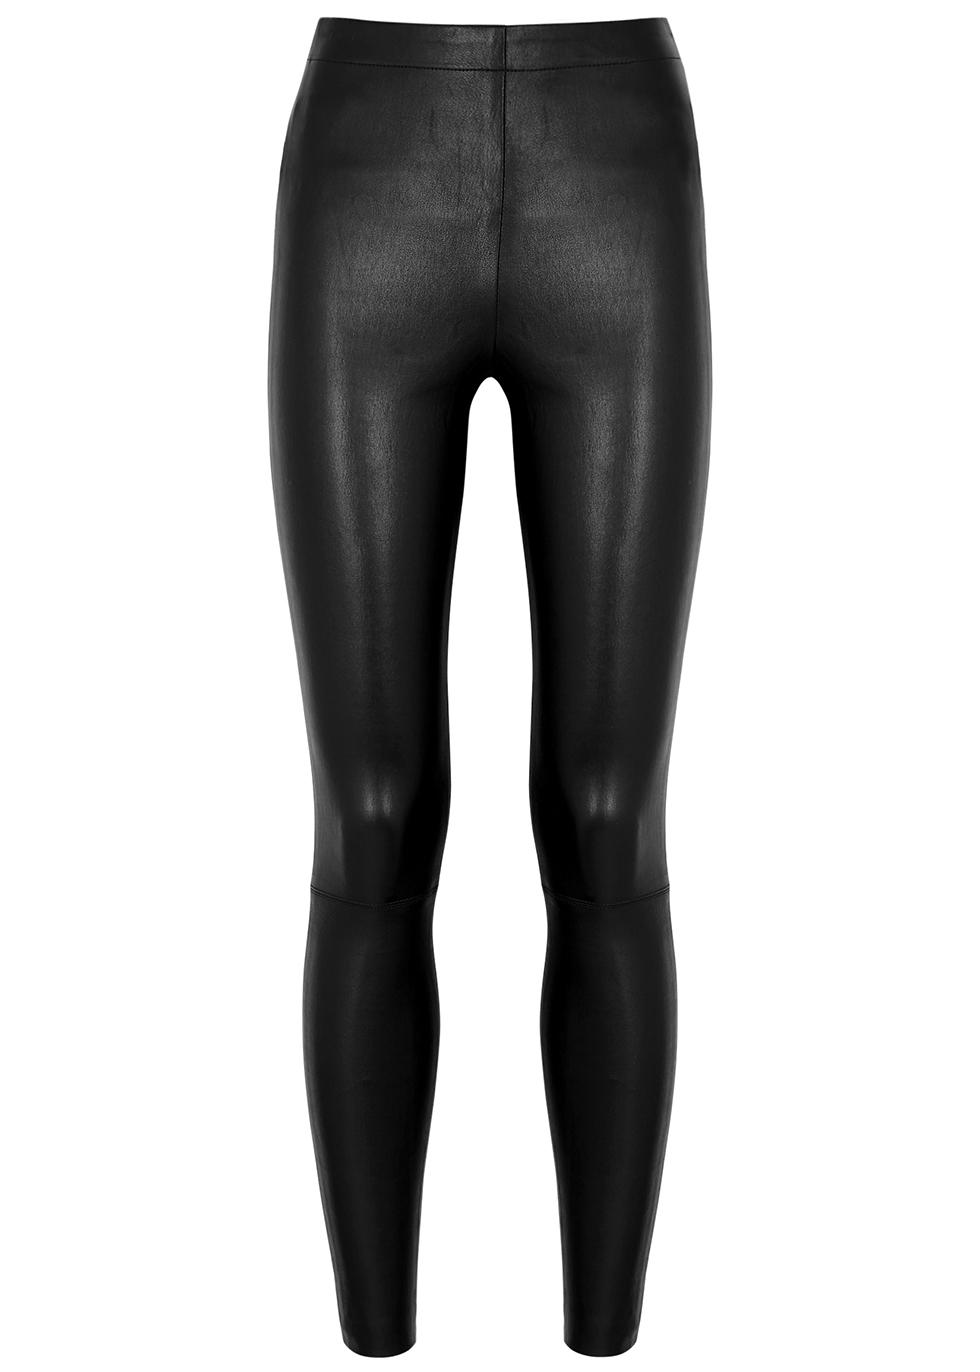 Maddox black leather leggings